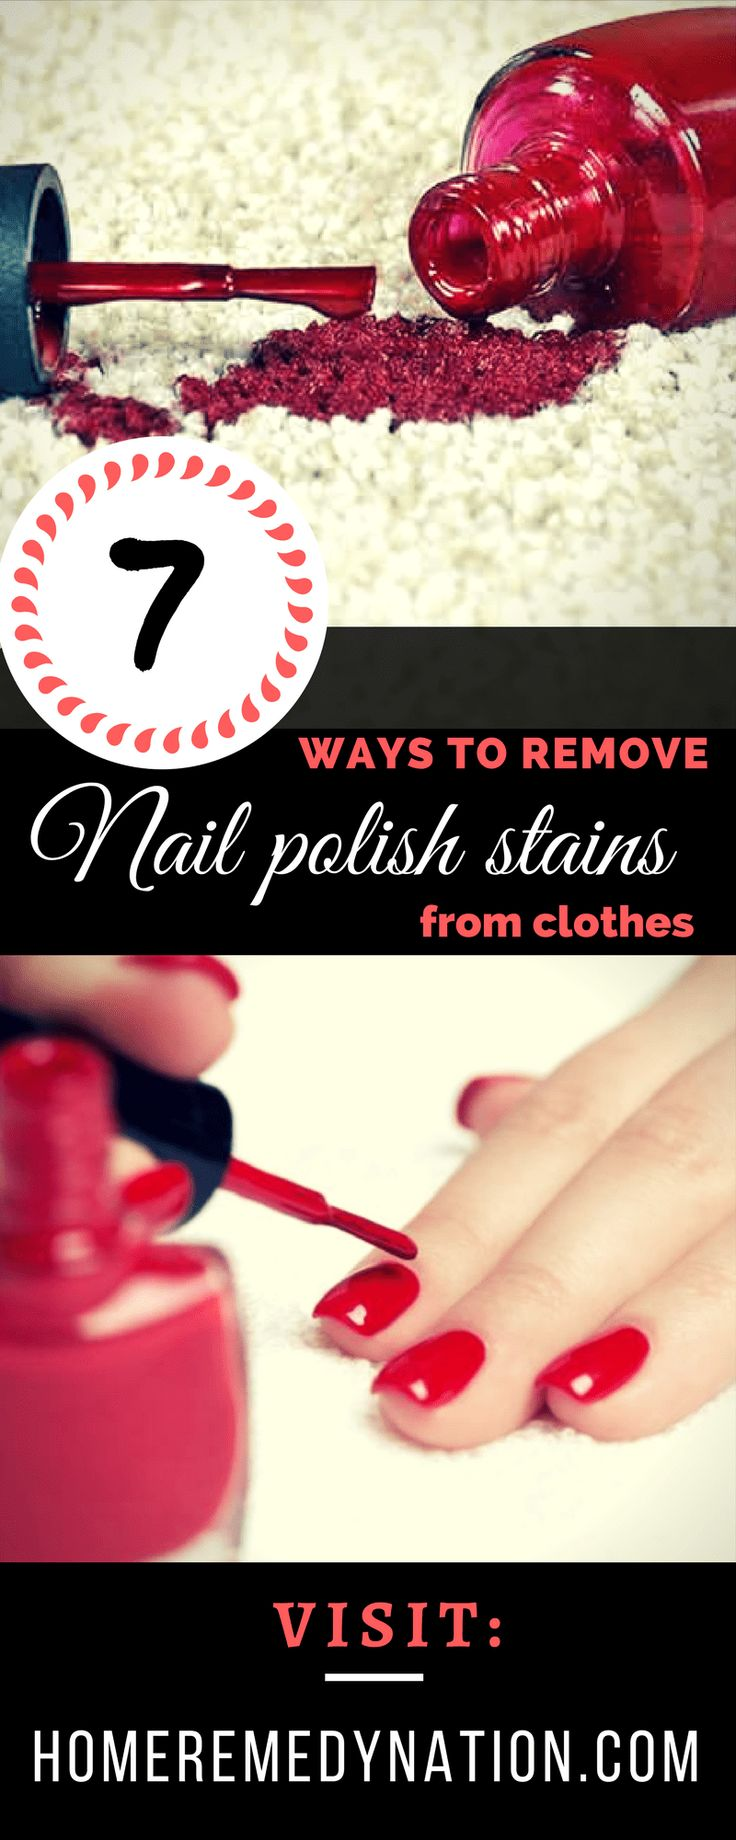 Removing dried nail polish from carpet - The 25 Best Nail Polish Stain Ideas On Pinterest Nail Polish Spray Bag Of Nails And Nail Polish Flowers